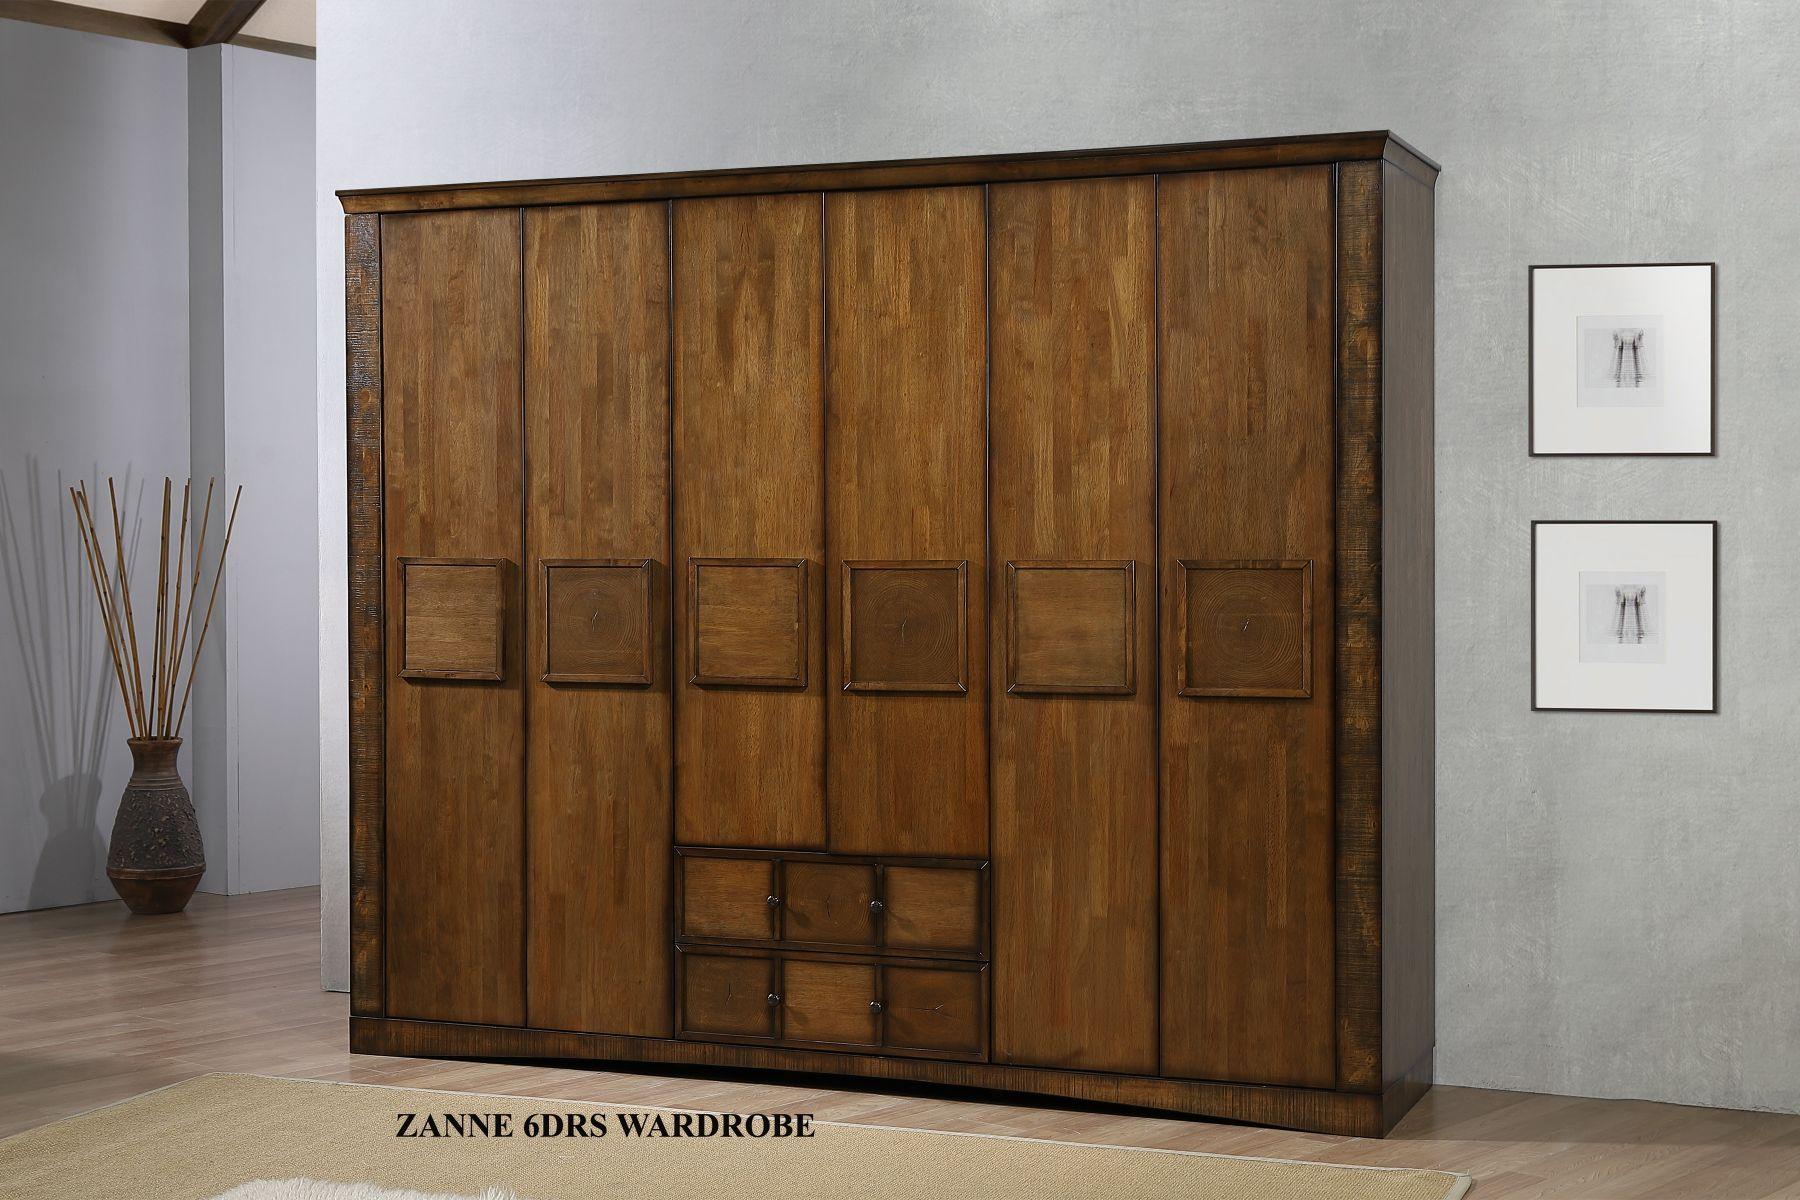 ZANNE 6DRS WARDROBE